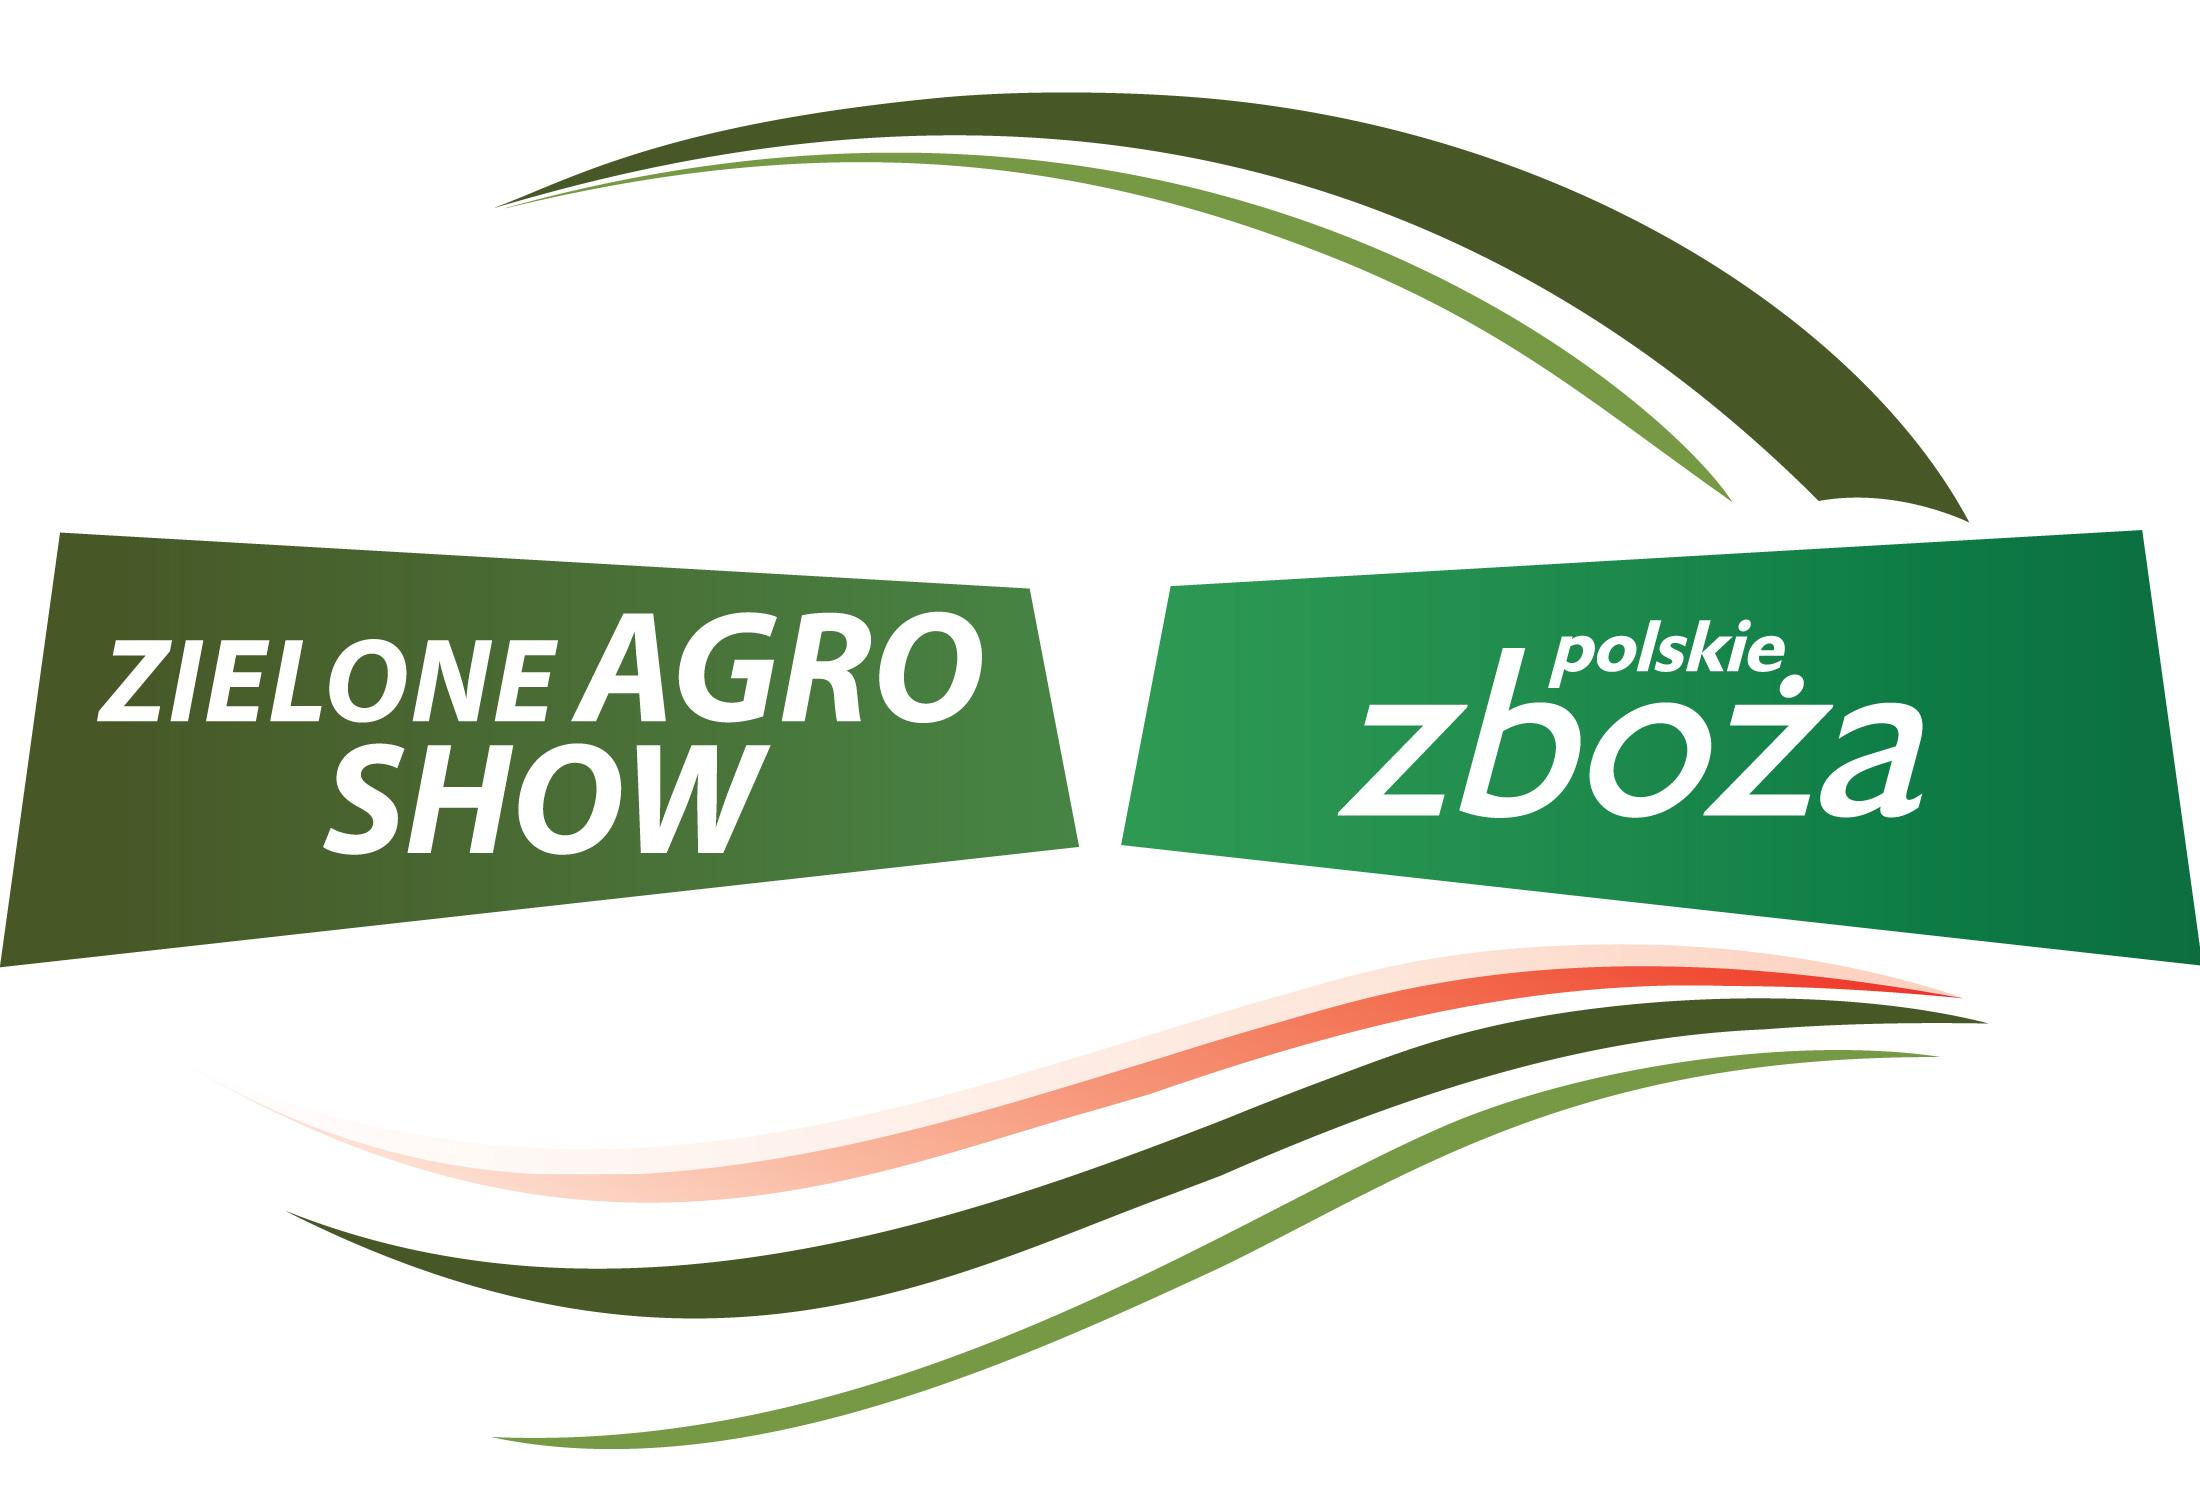 Zielone AgroShow